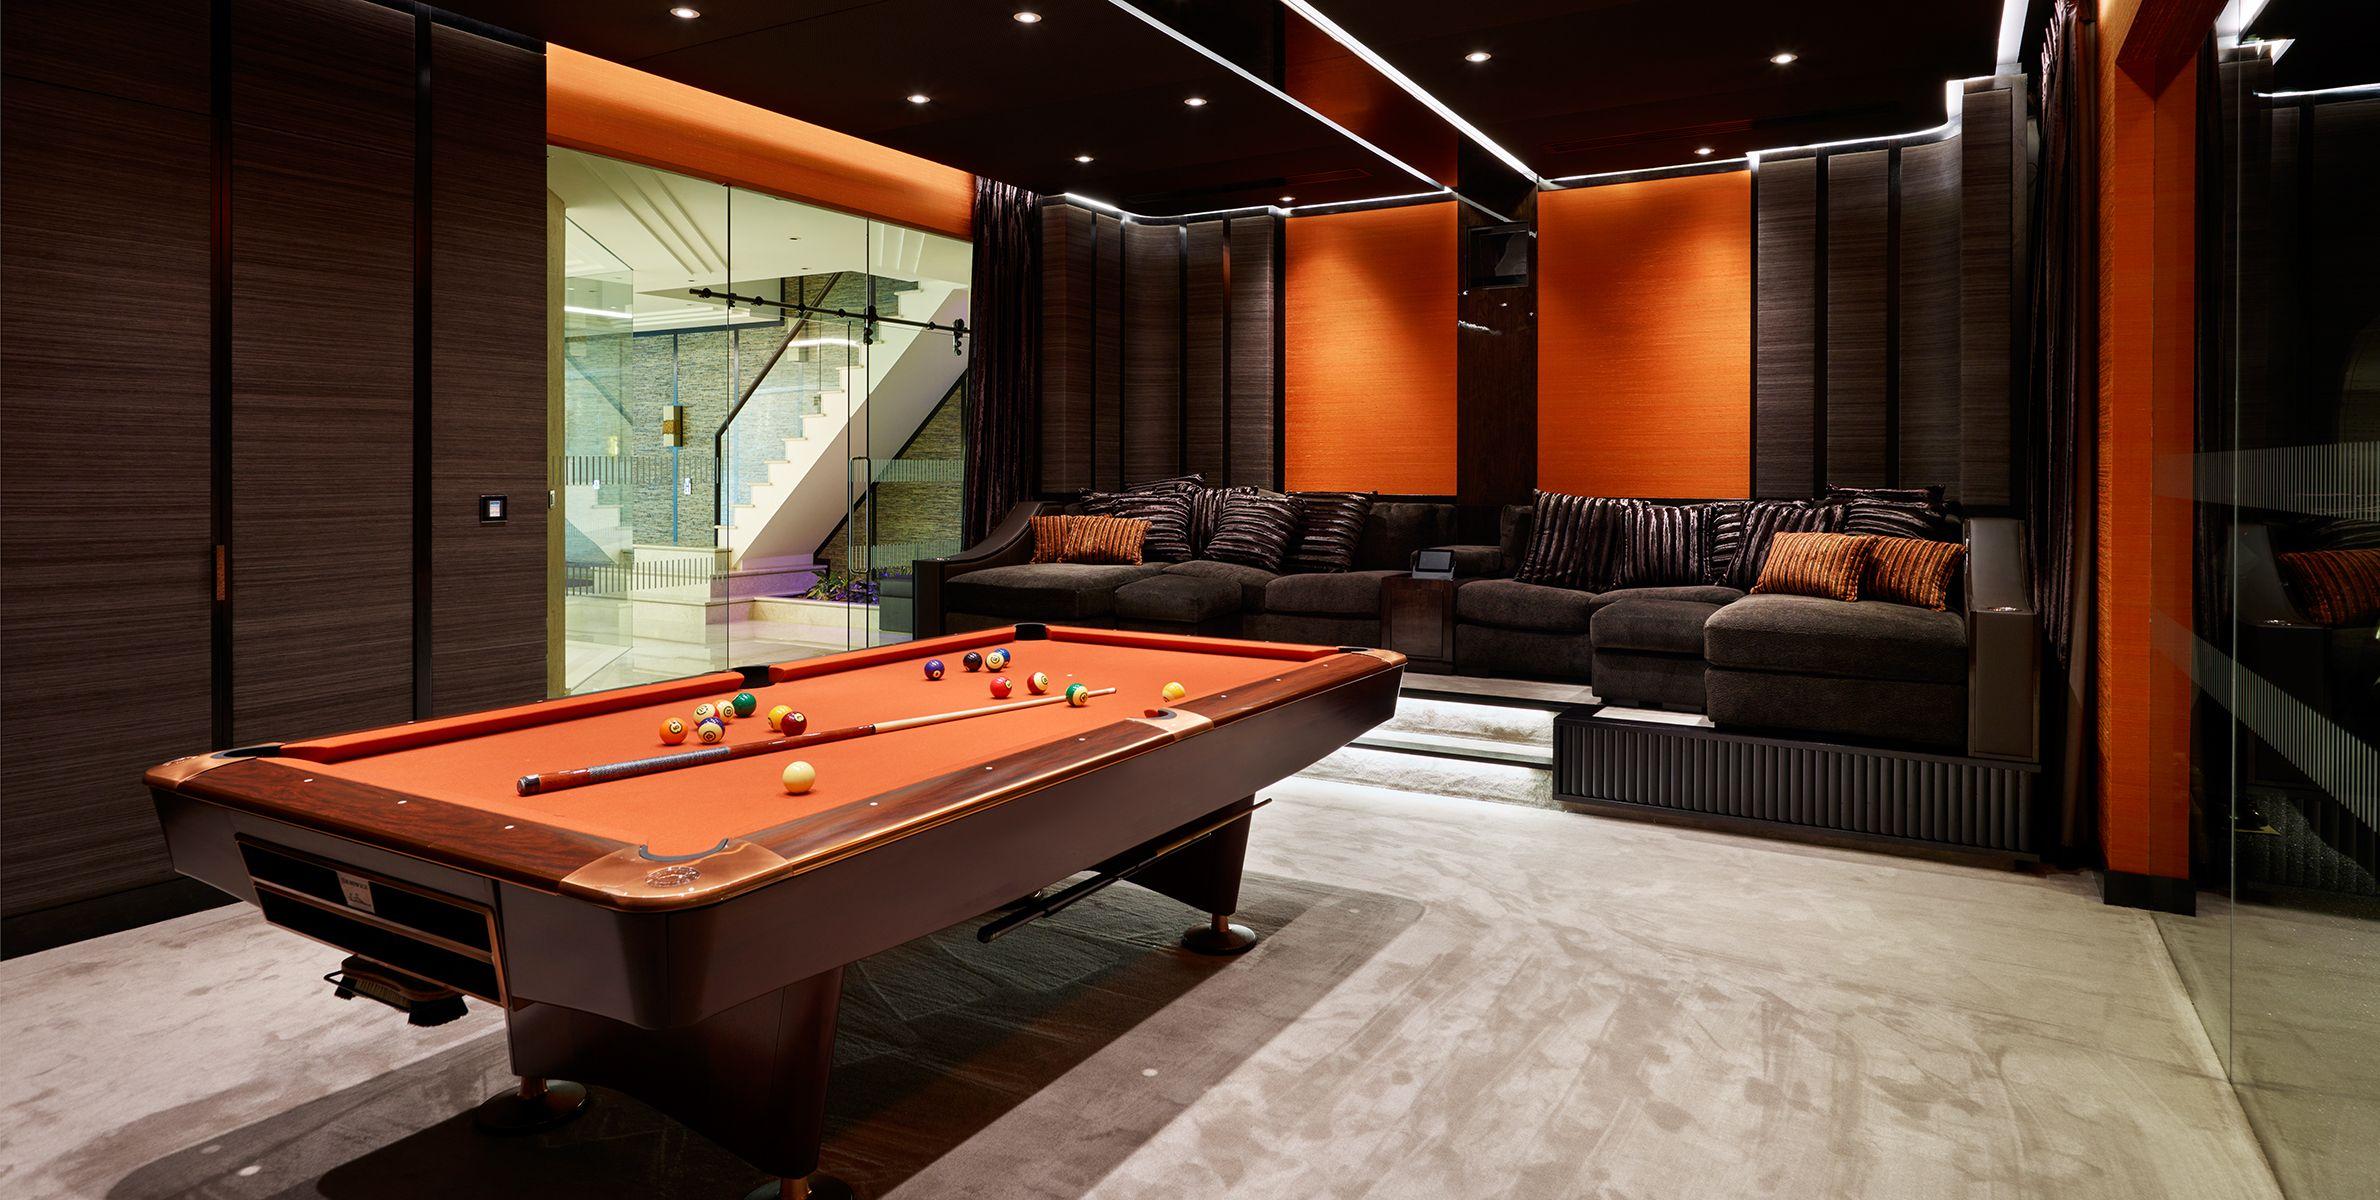 54 Best Billiard Room Images On Pinterest: Stephen Clasper Interiors